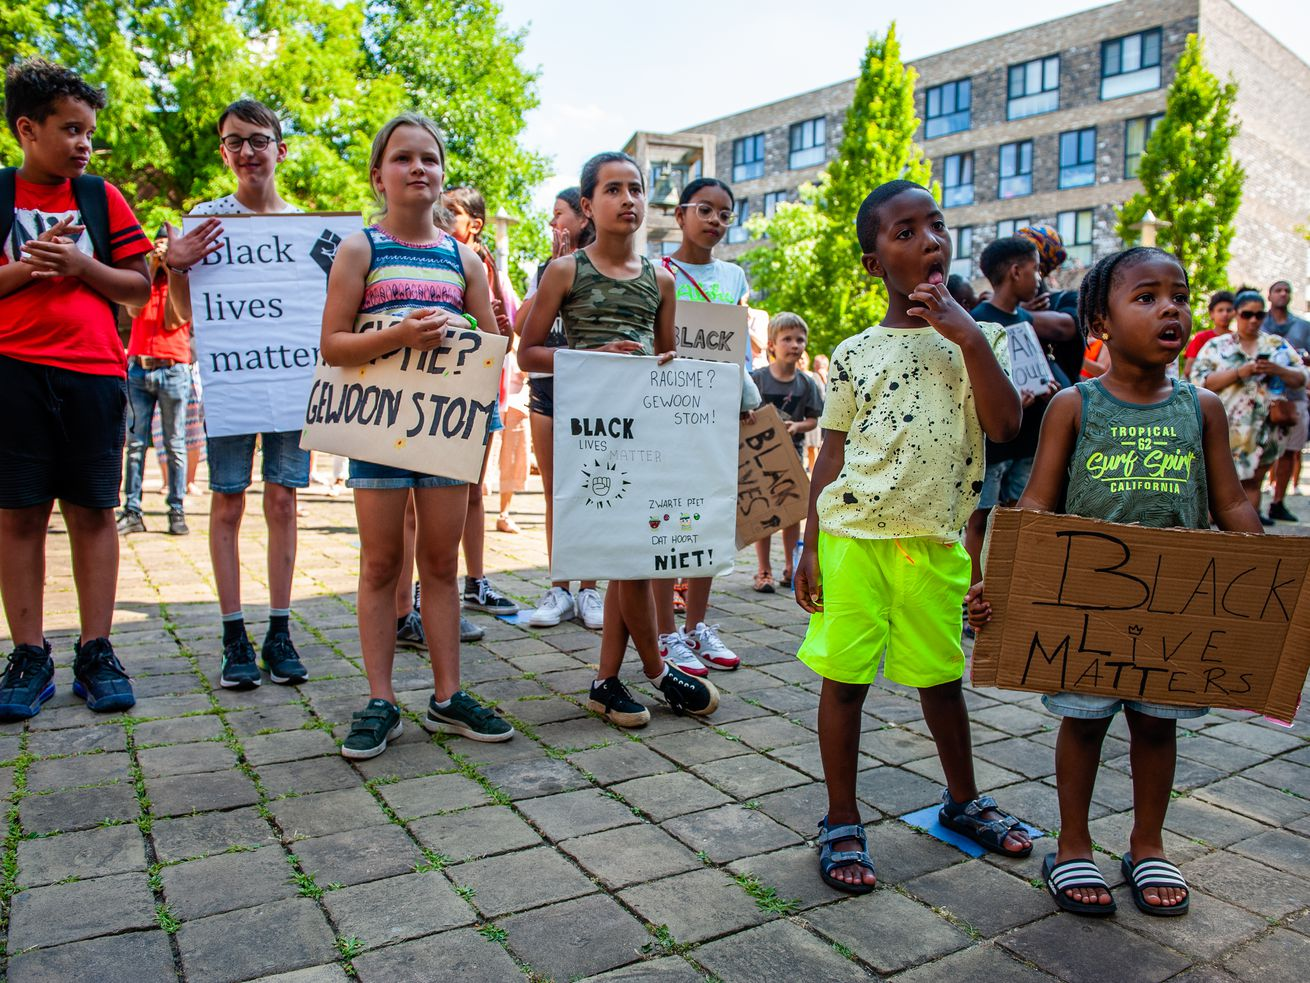 Black Lives Matter Children Demonstration In Diemen, Netherlands